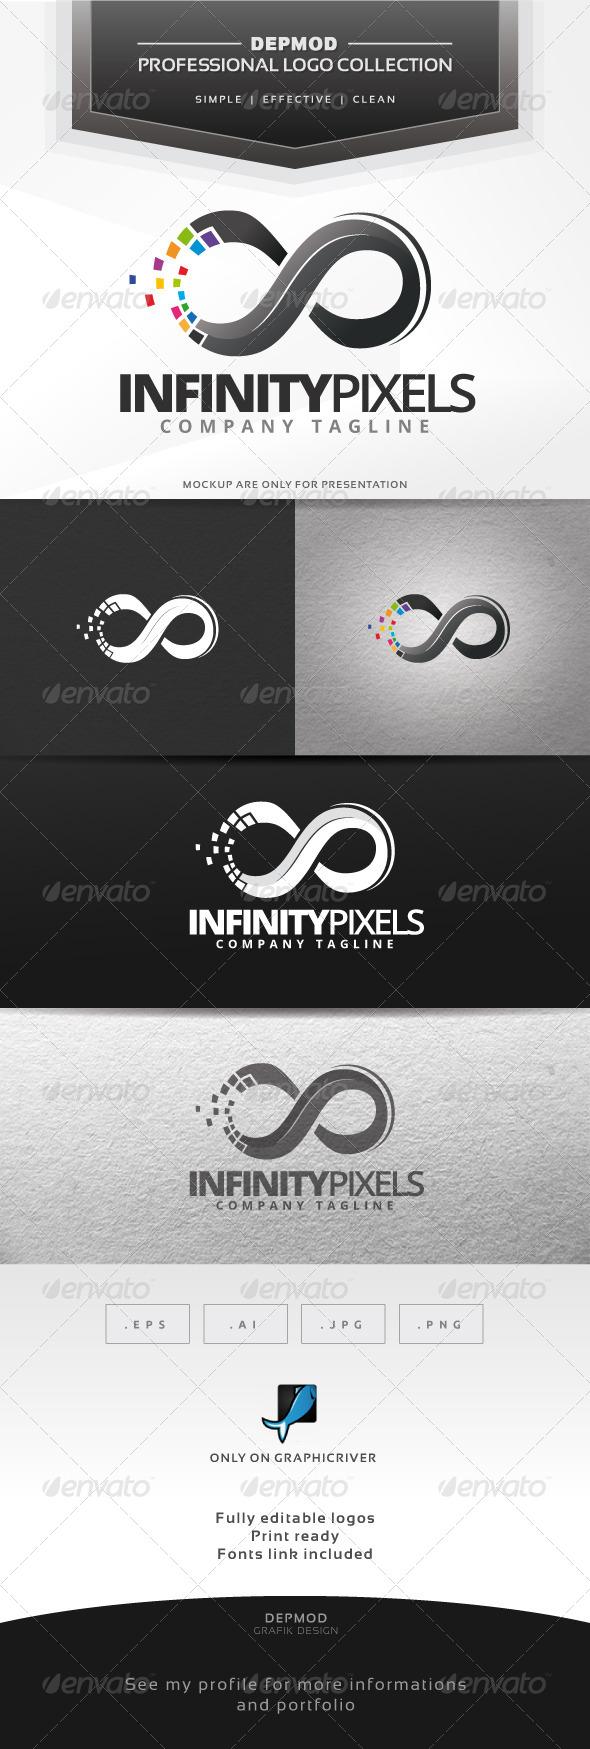 Infinity Pixels Logo